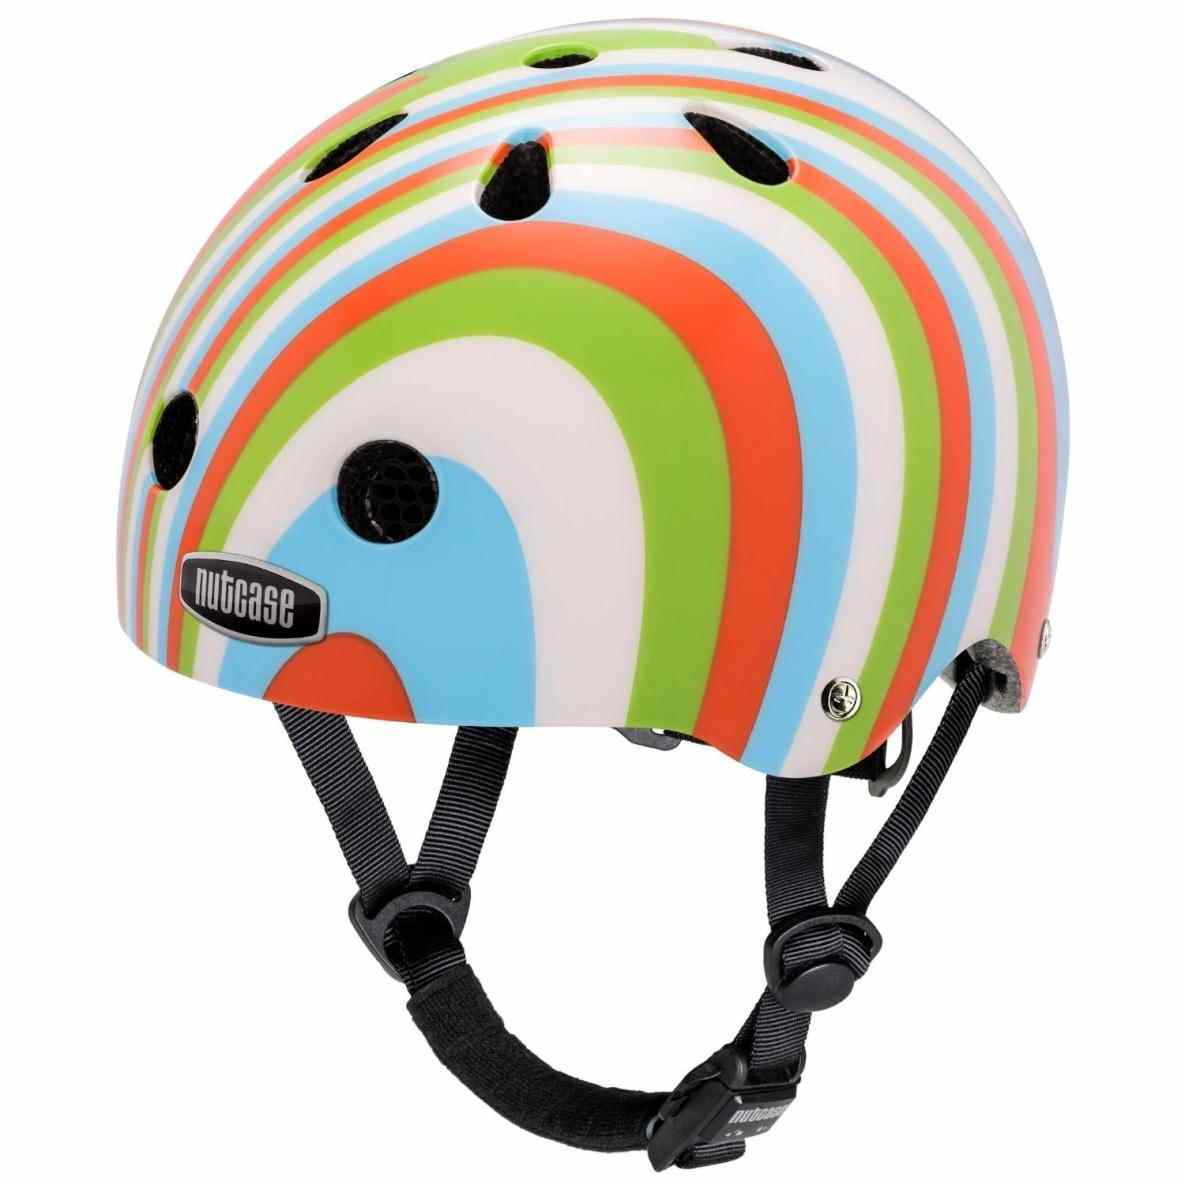 1185x1185 Bicycle Helmet Clip Art Bikejon.win